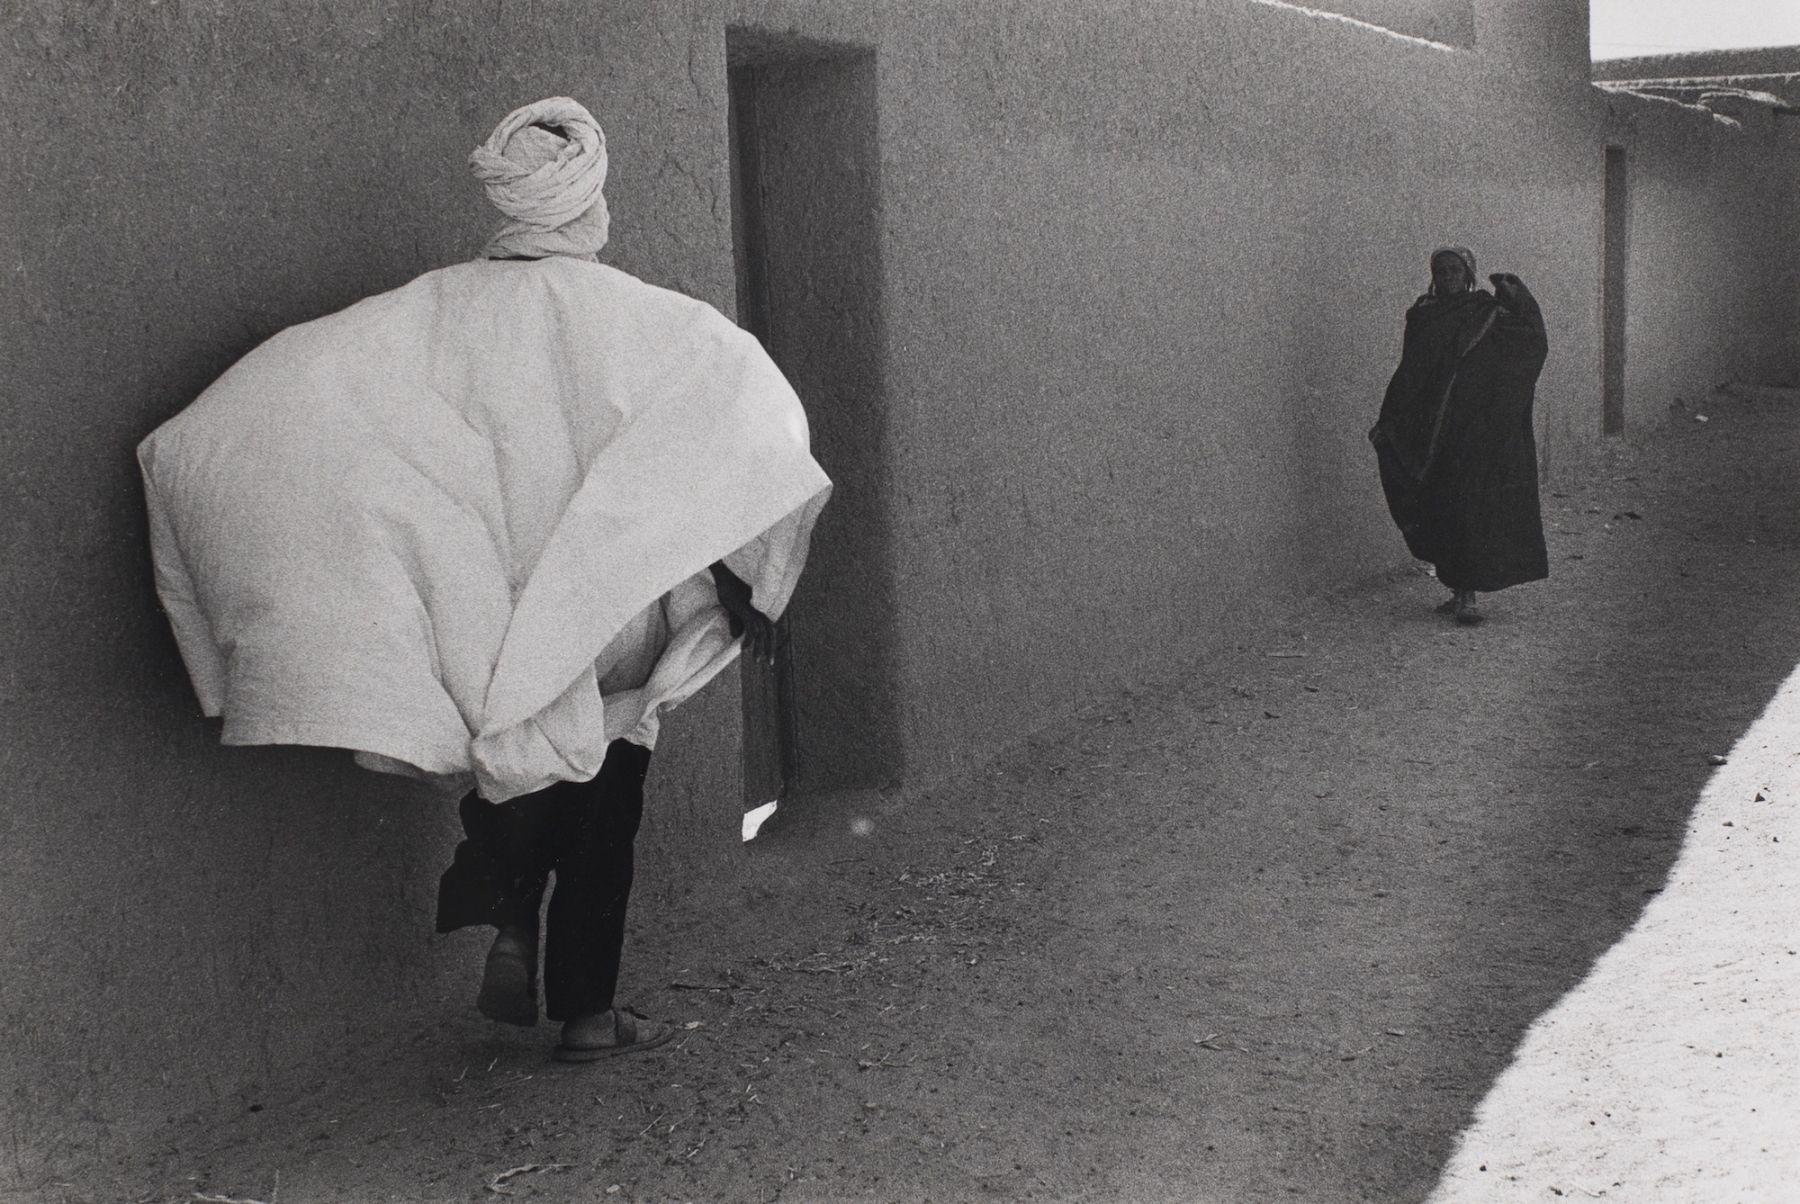 Bernard Plossu (1945-)  Acades, Niger, 1975  Gelatin silver print  12 x 16 inches (paper), black and white photography